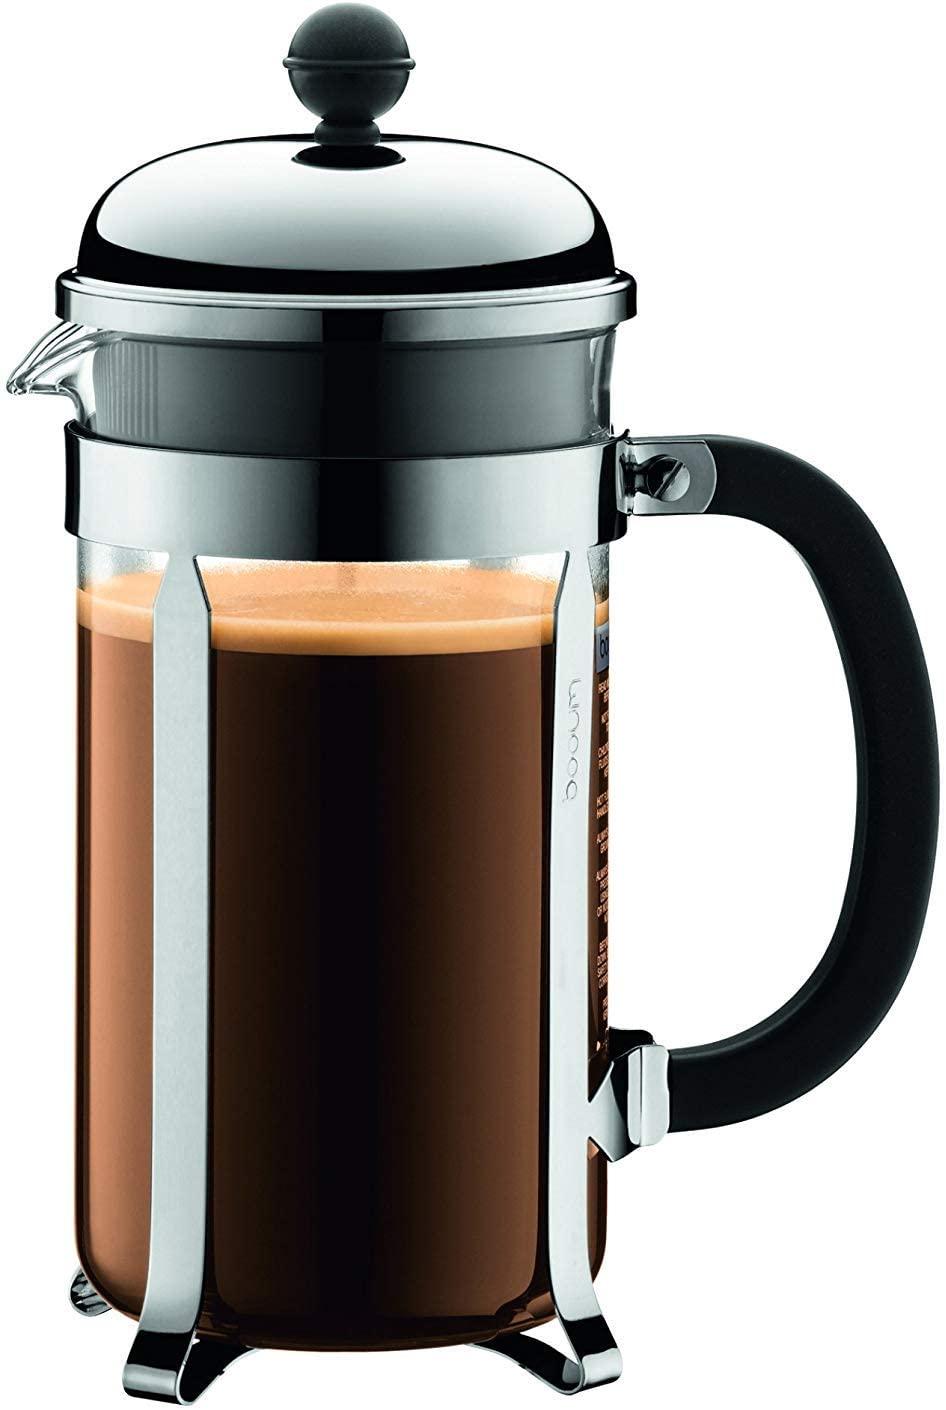 best french press   Bodum 1928-16US4 Chambord French Press Coffee Maker